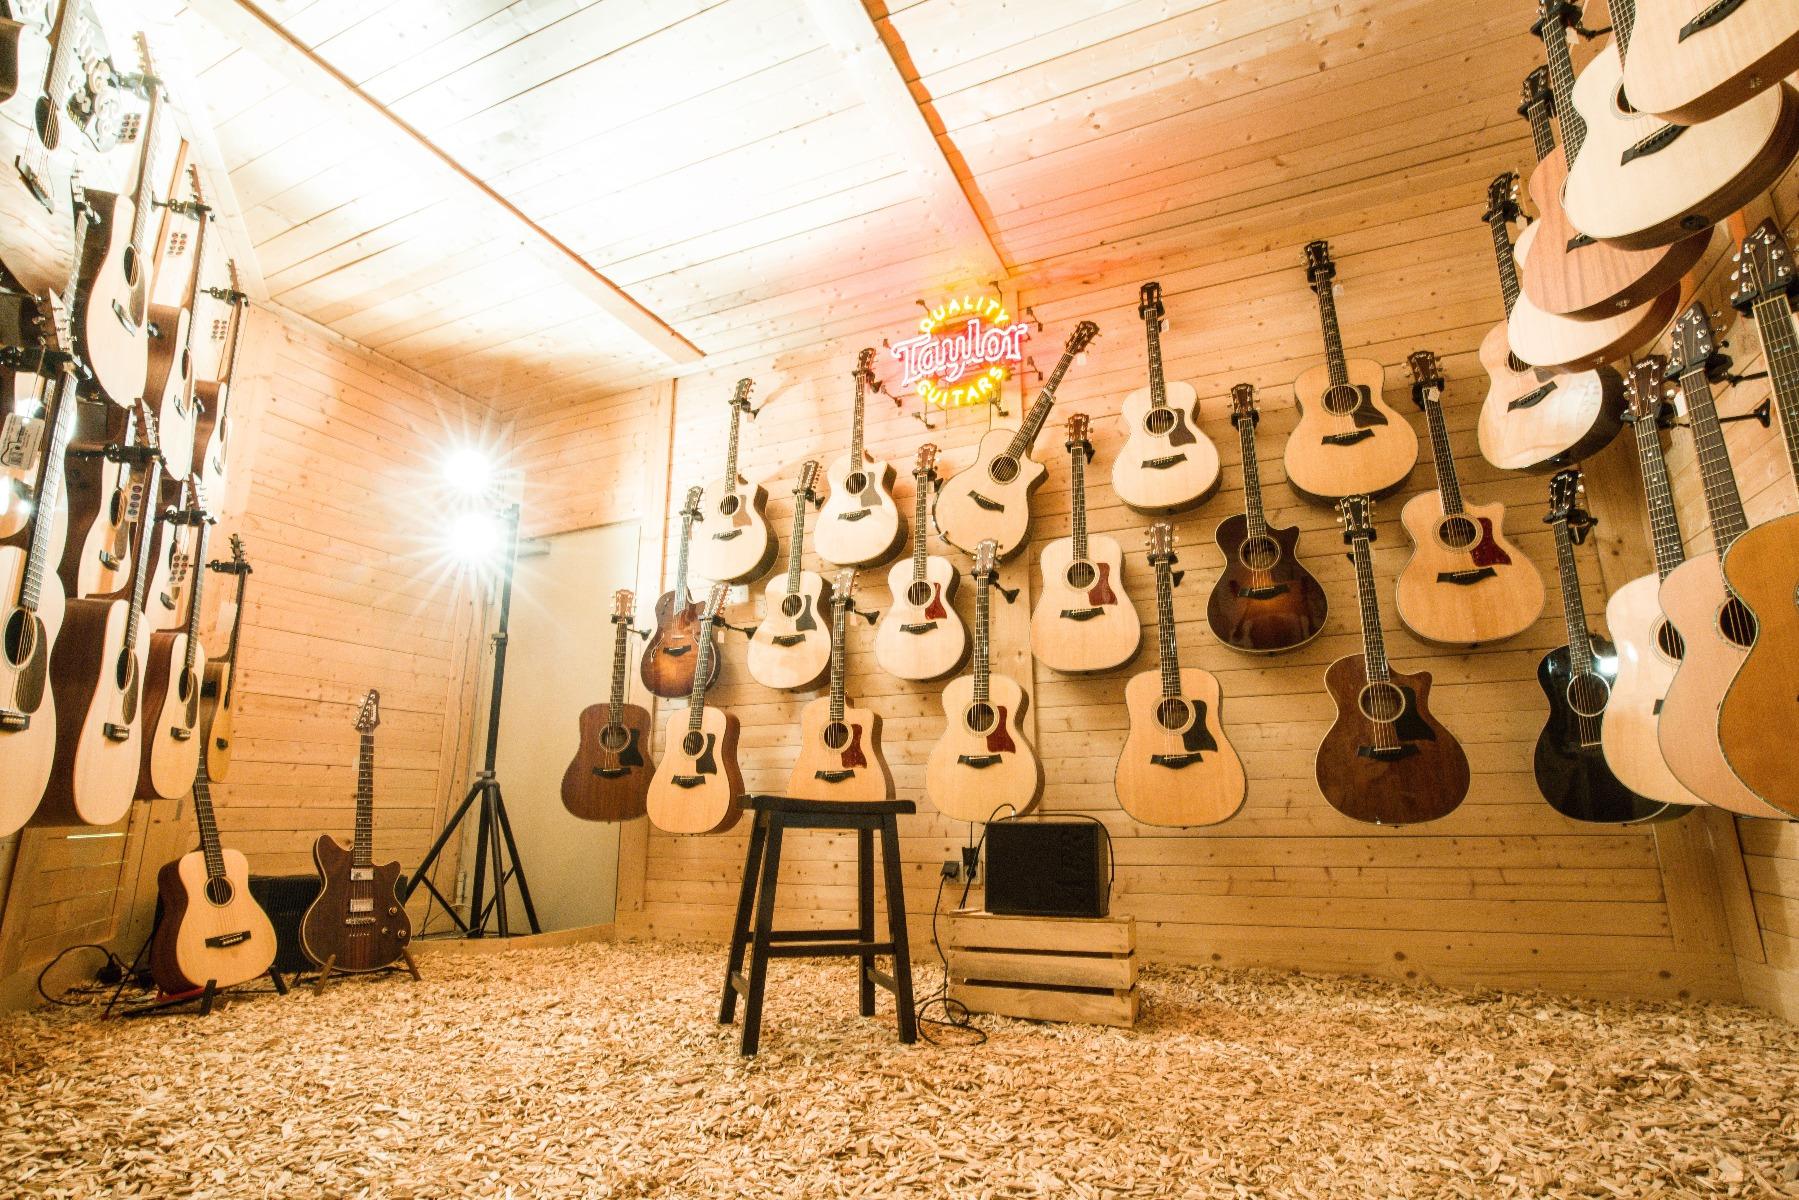 Unsere Auswahl an Akustikgitarren